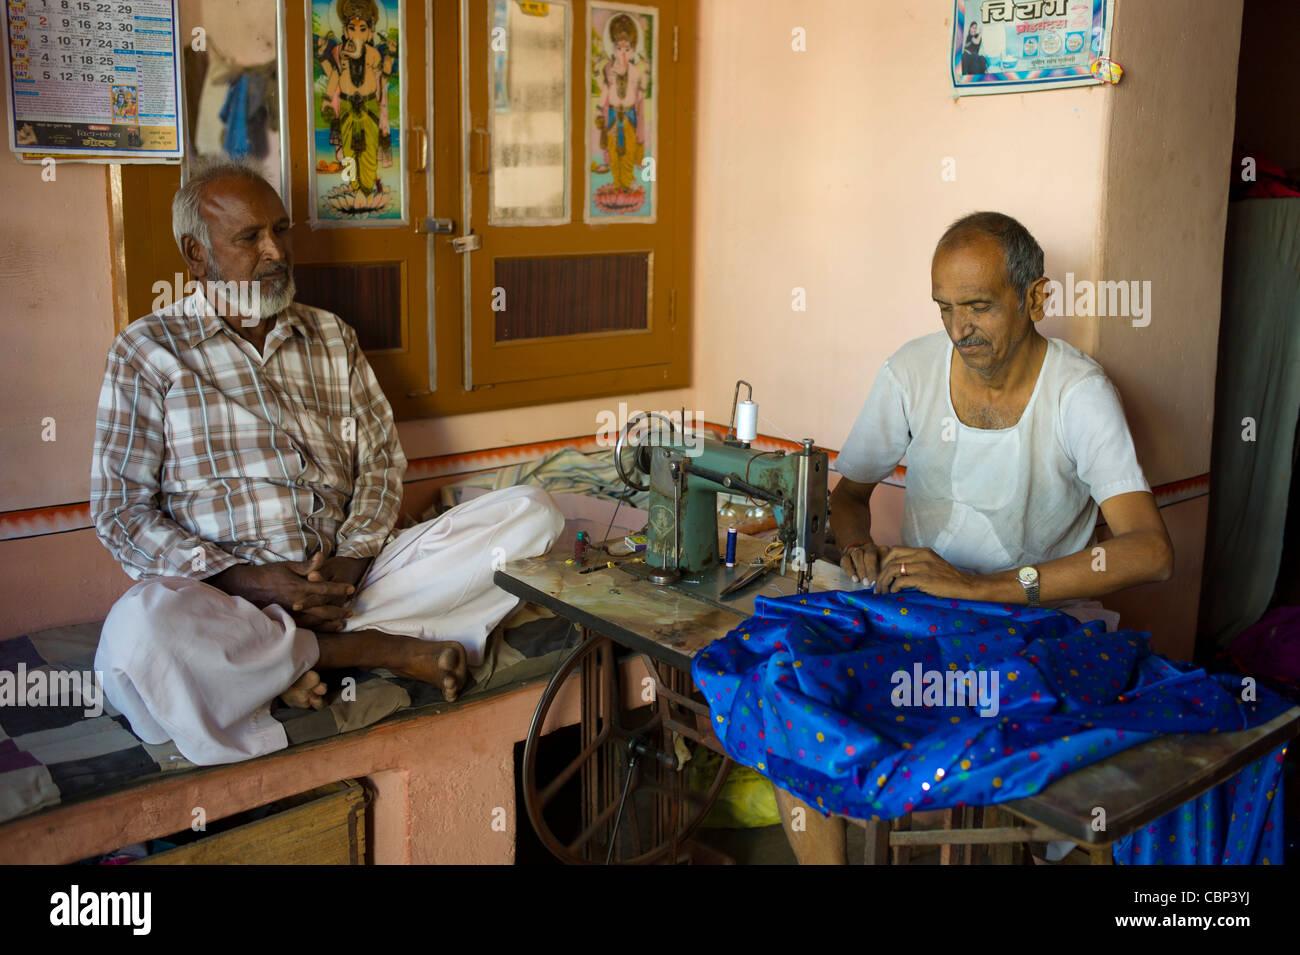 Indian man with old sewing machine making sari in Narlai village in Rajasthan, Northern India Stock Photo